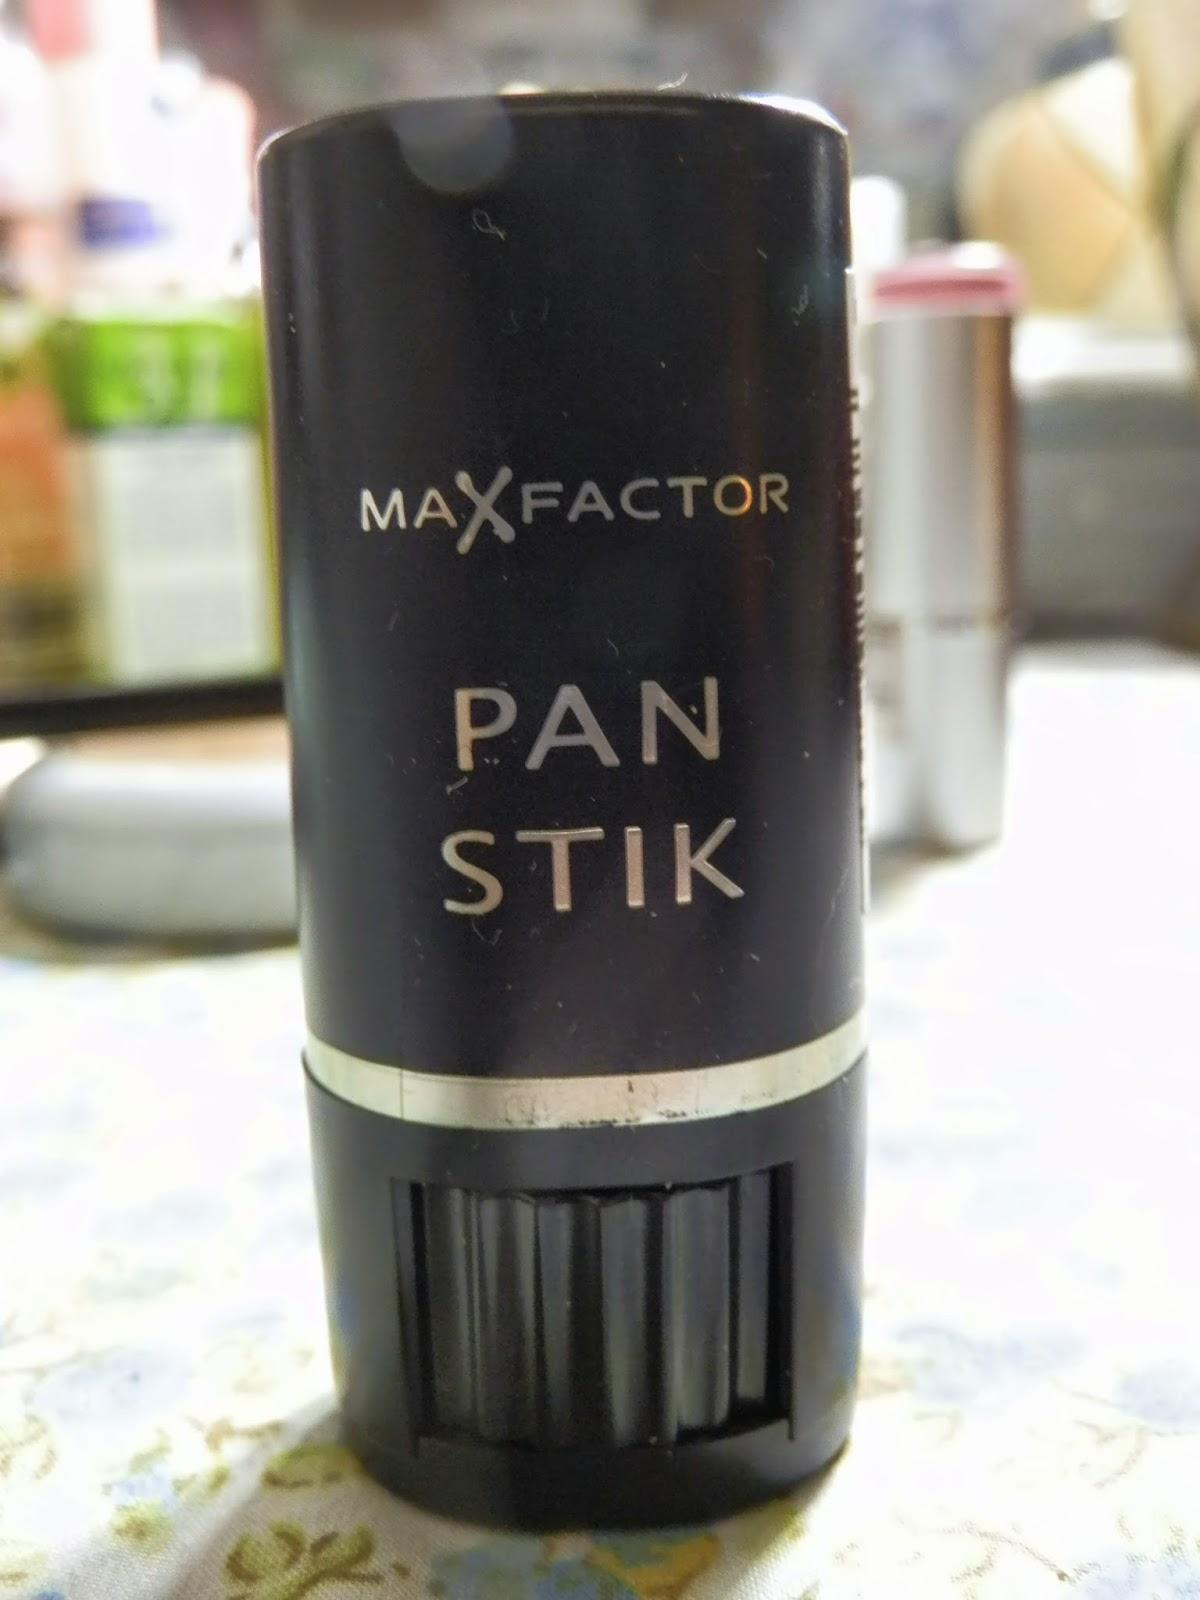 "<img alt=""max-factor-pan-stik-olive"" src=""max-factor-pan-stik-olive.jpg"